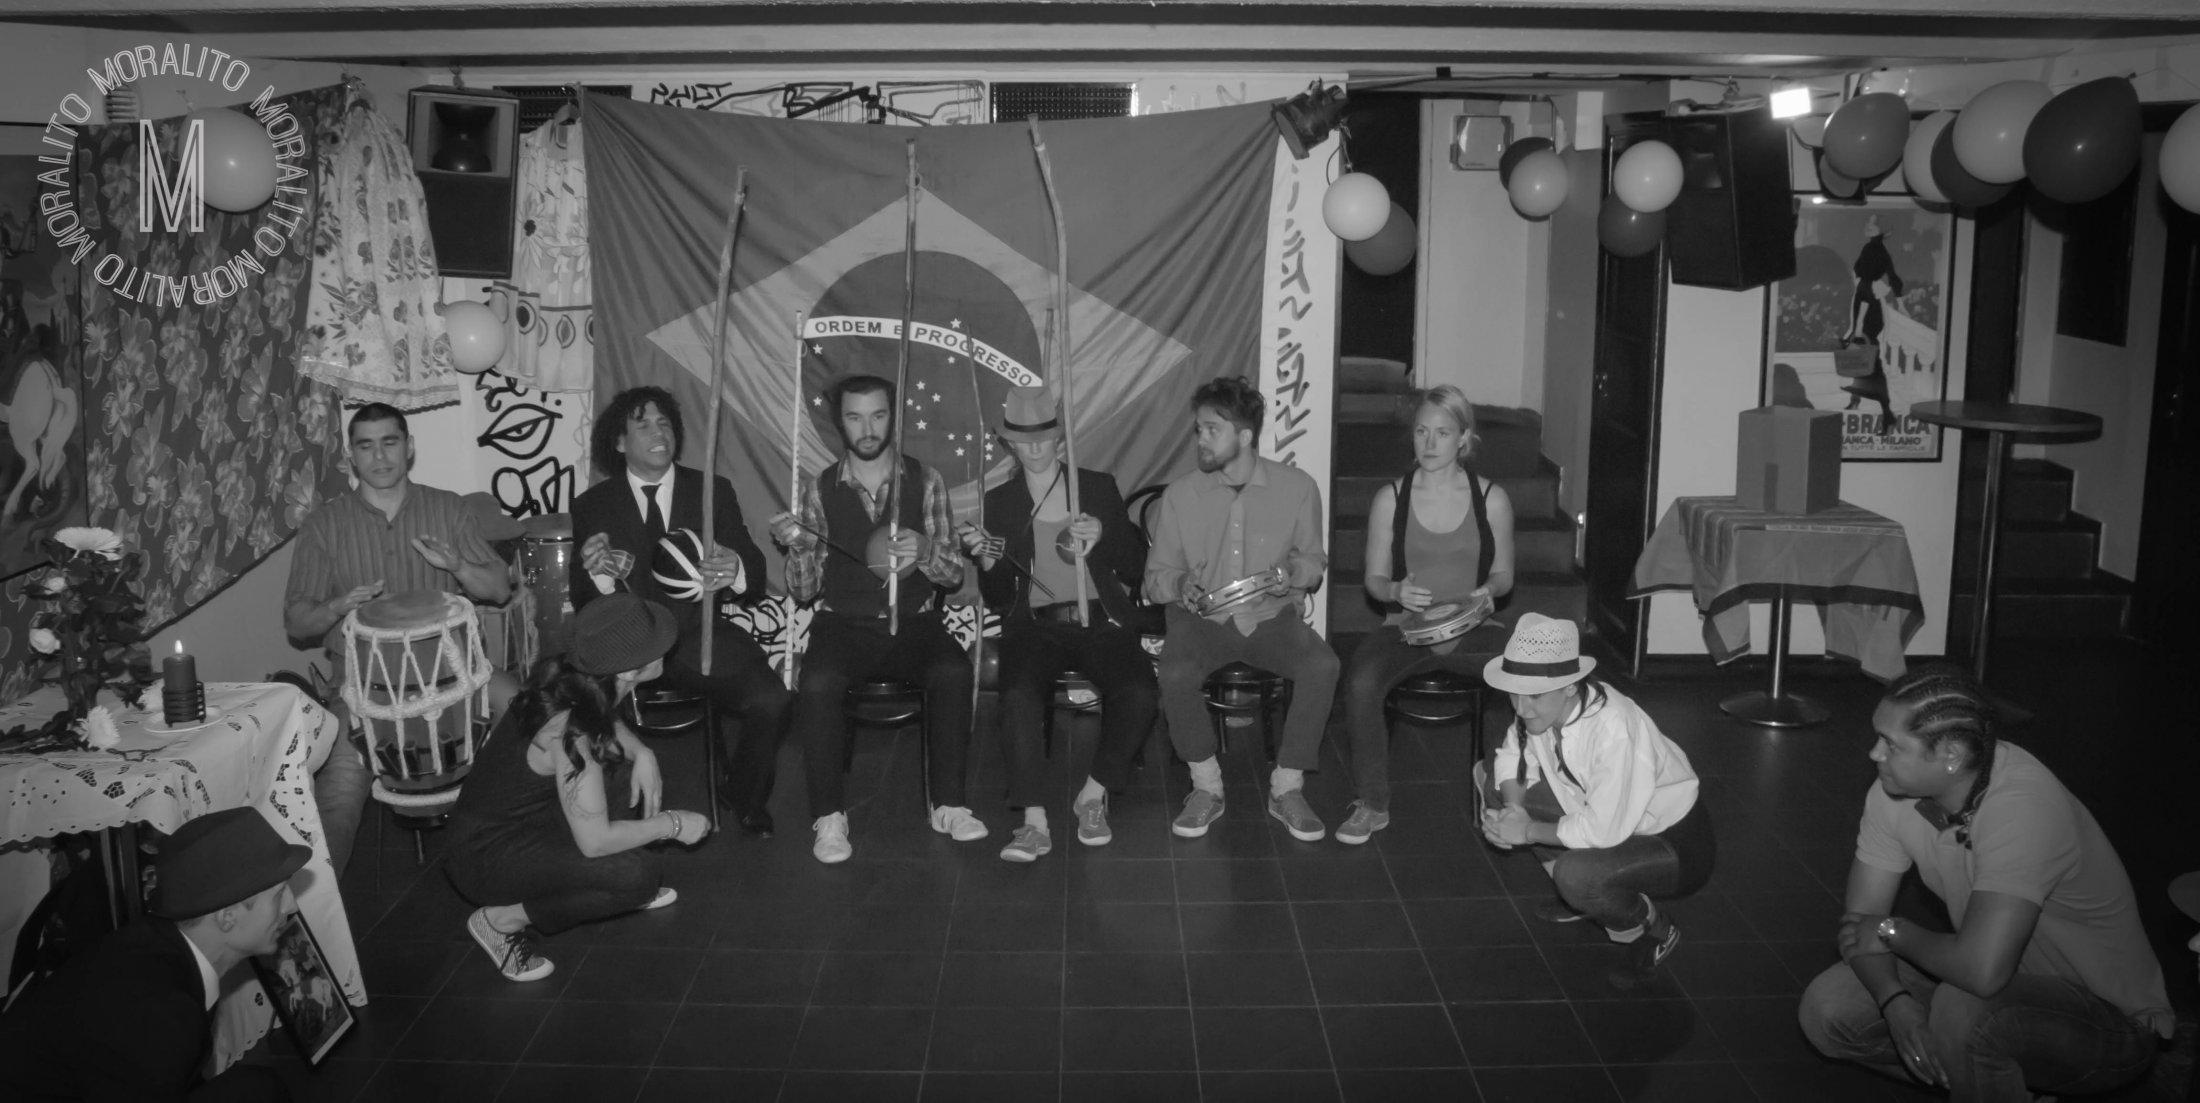 Evento Kultural - Kiura-14 - Copy